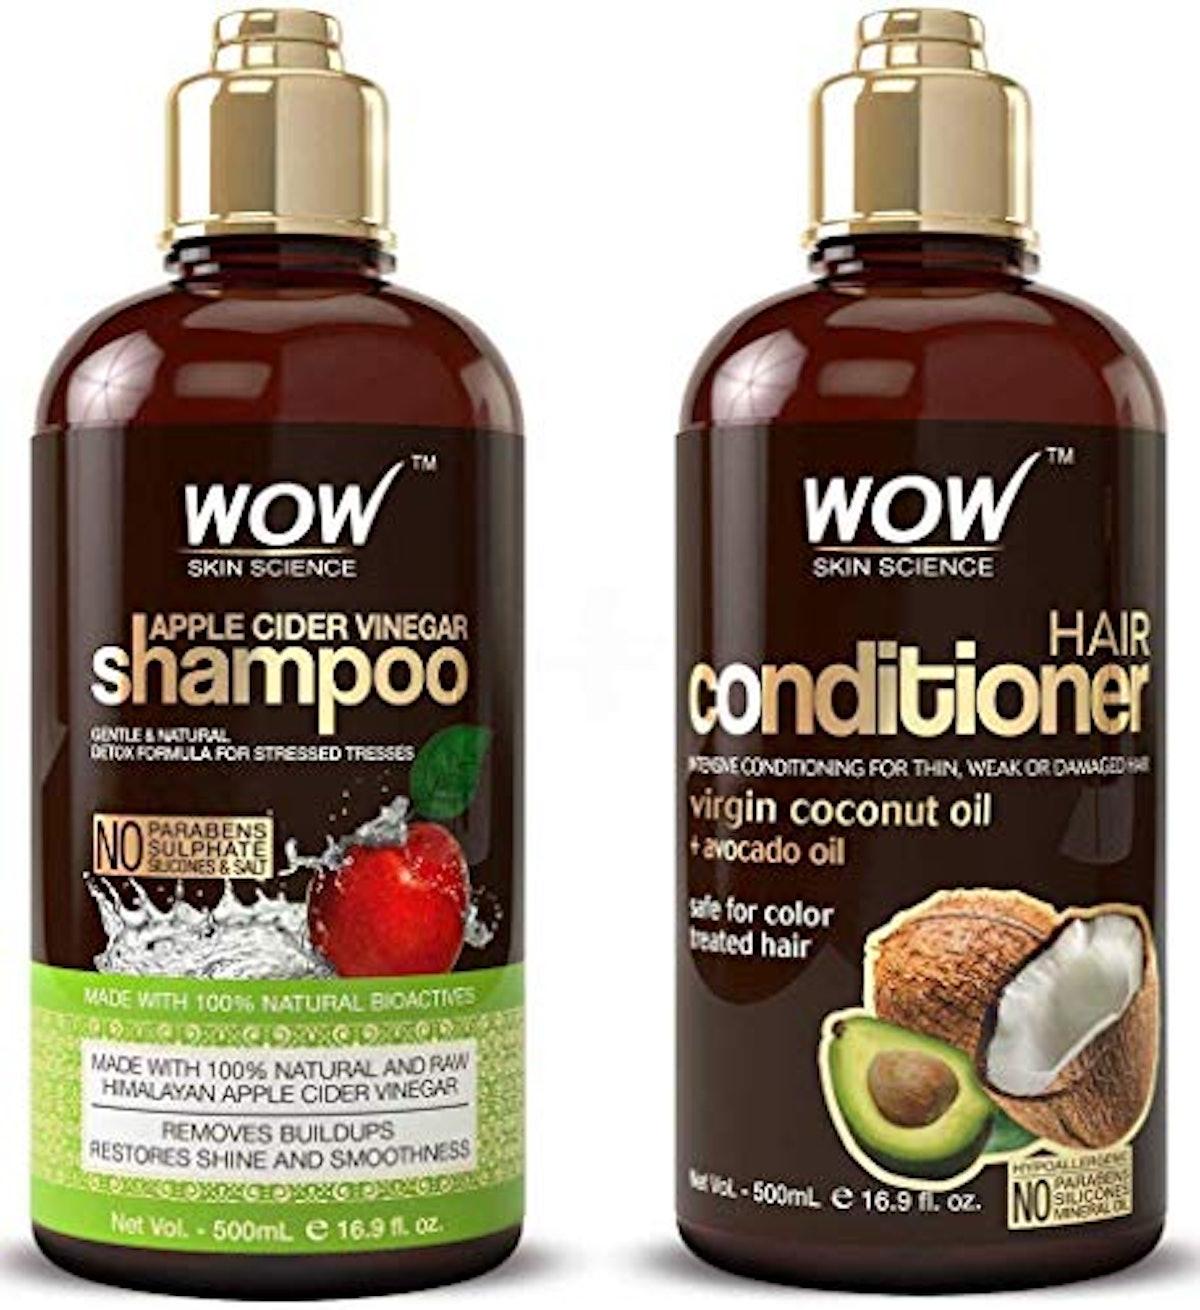 WOW Apple Cider Vinegar Shampoo and Hair Conditioner Set